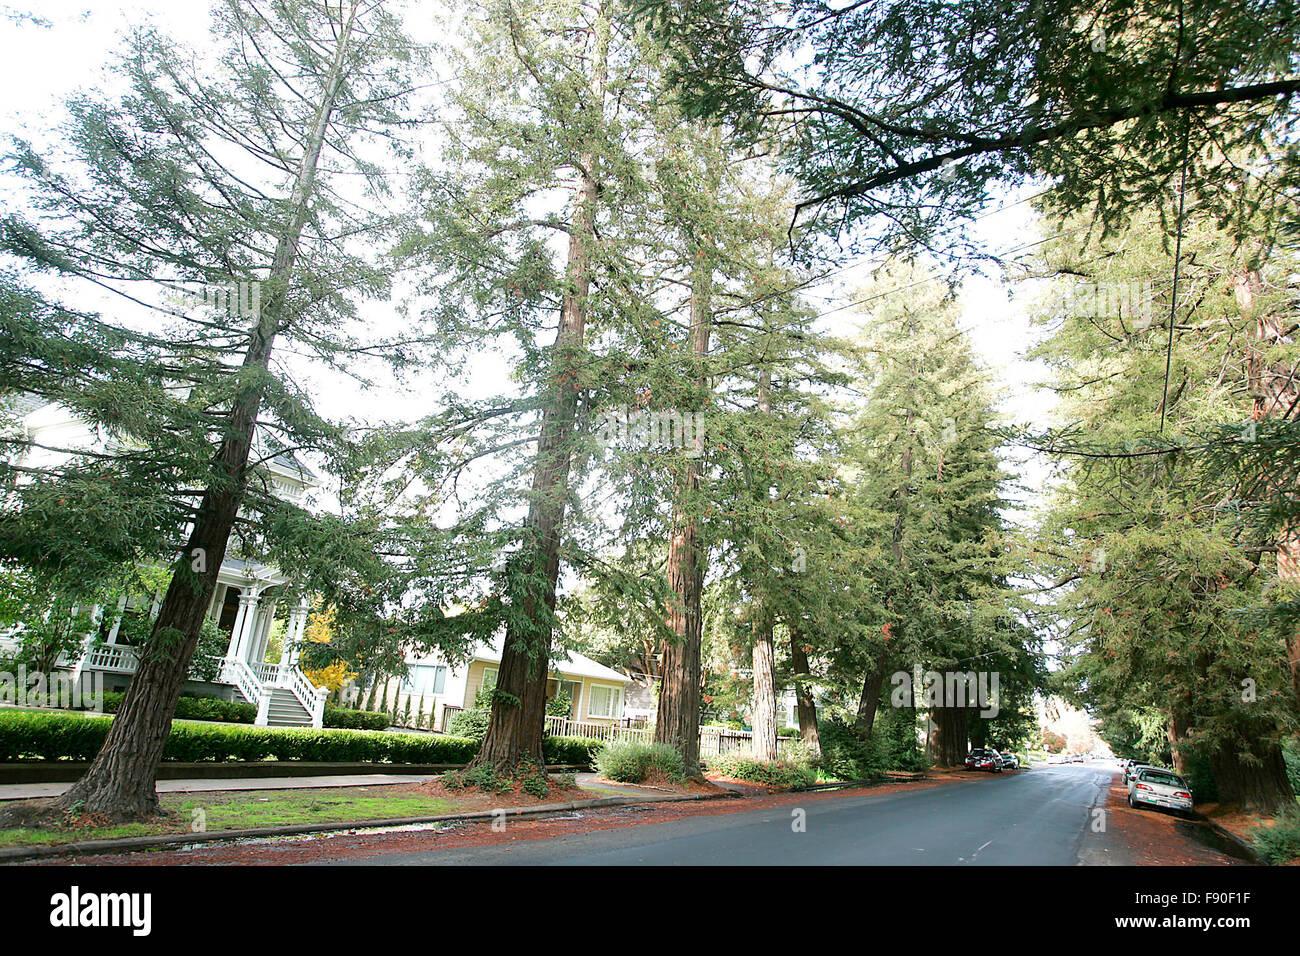 Napa, CA, USA. 7th Dec, 2015. Redwood trees line Franklin Street in the Napa Abajo-Fuller Park Historic District, - Stock Image